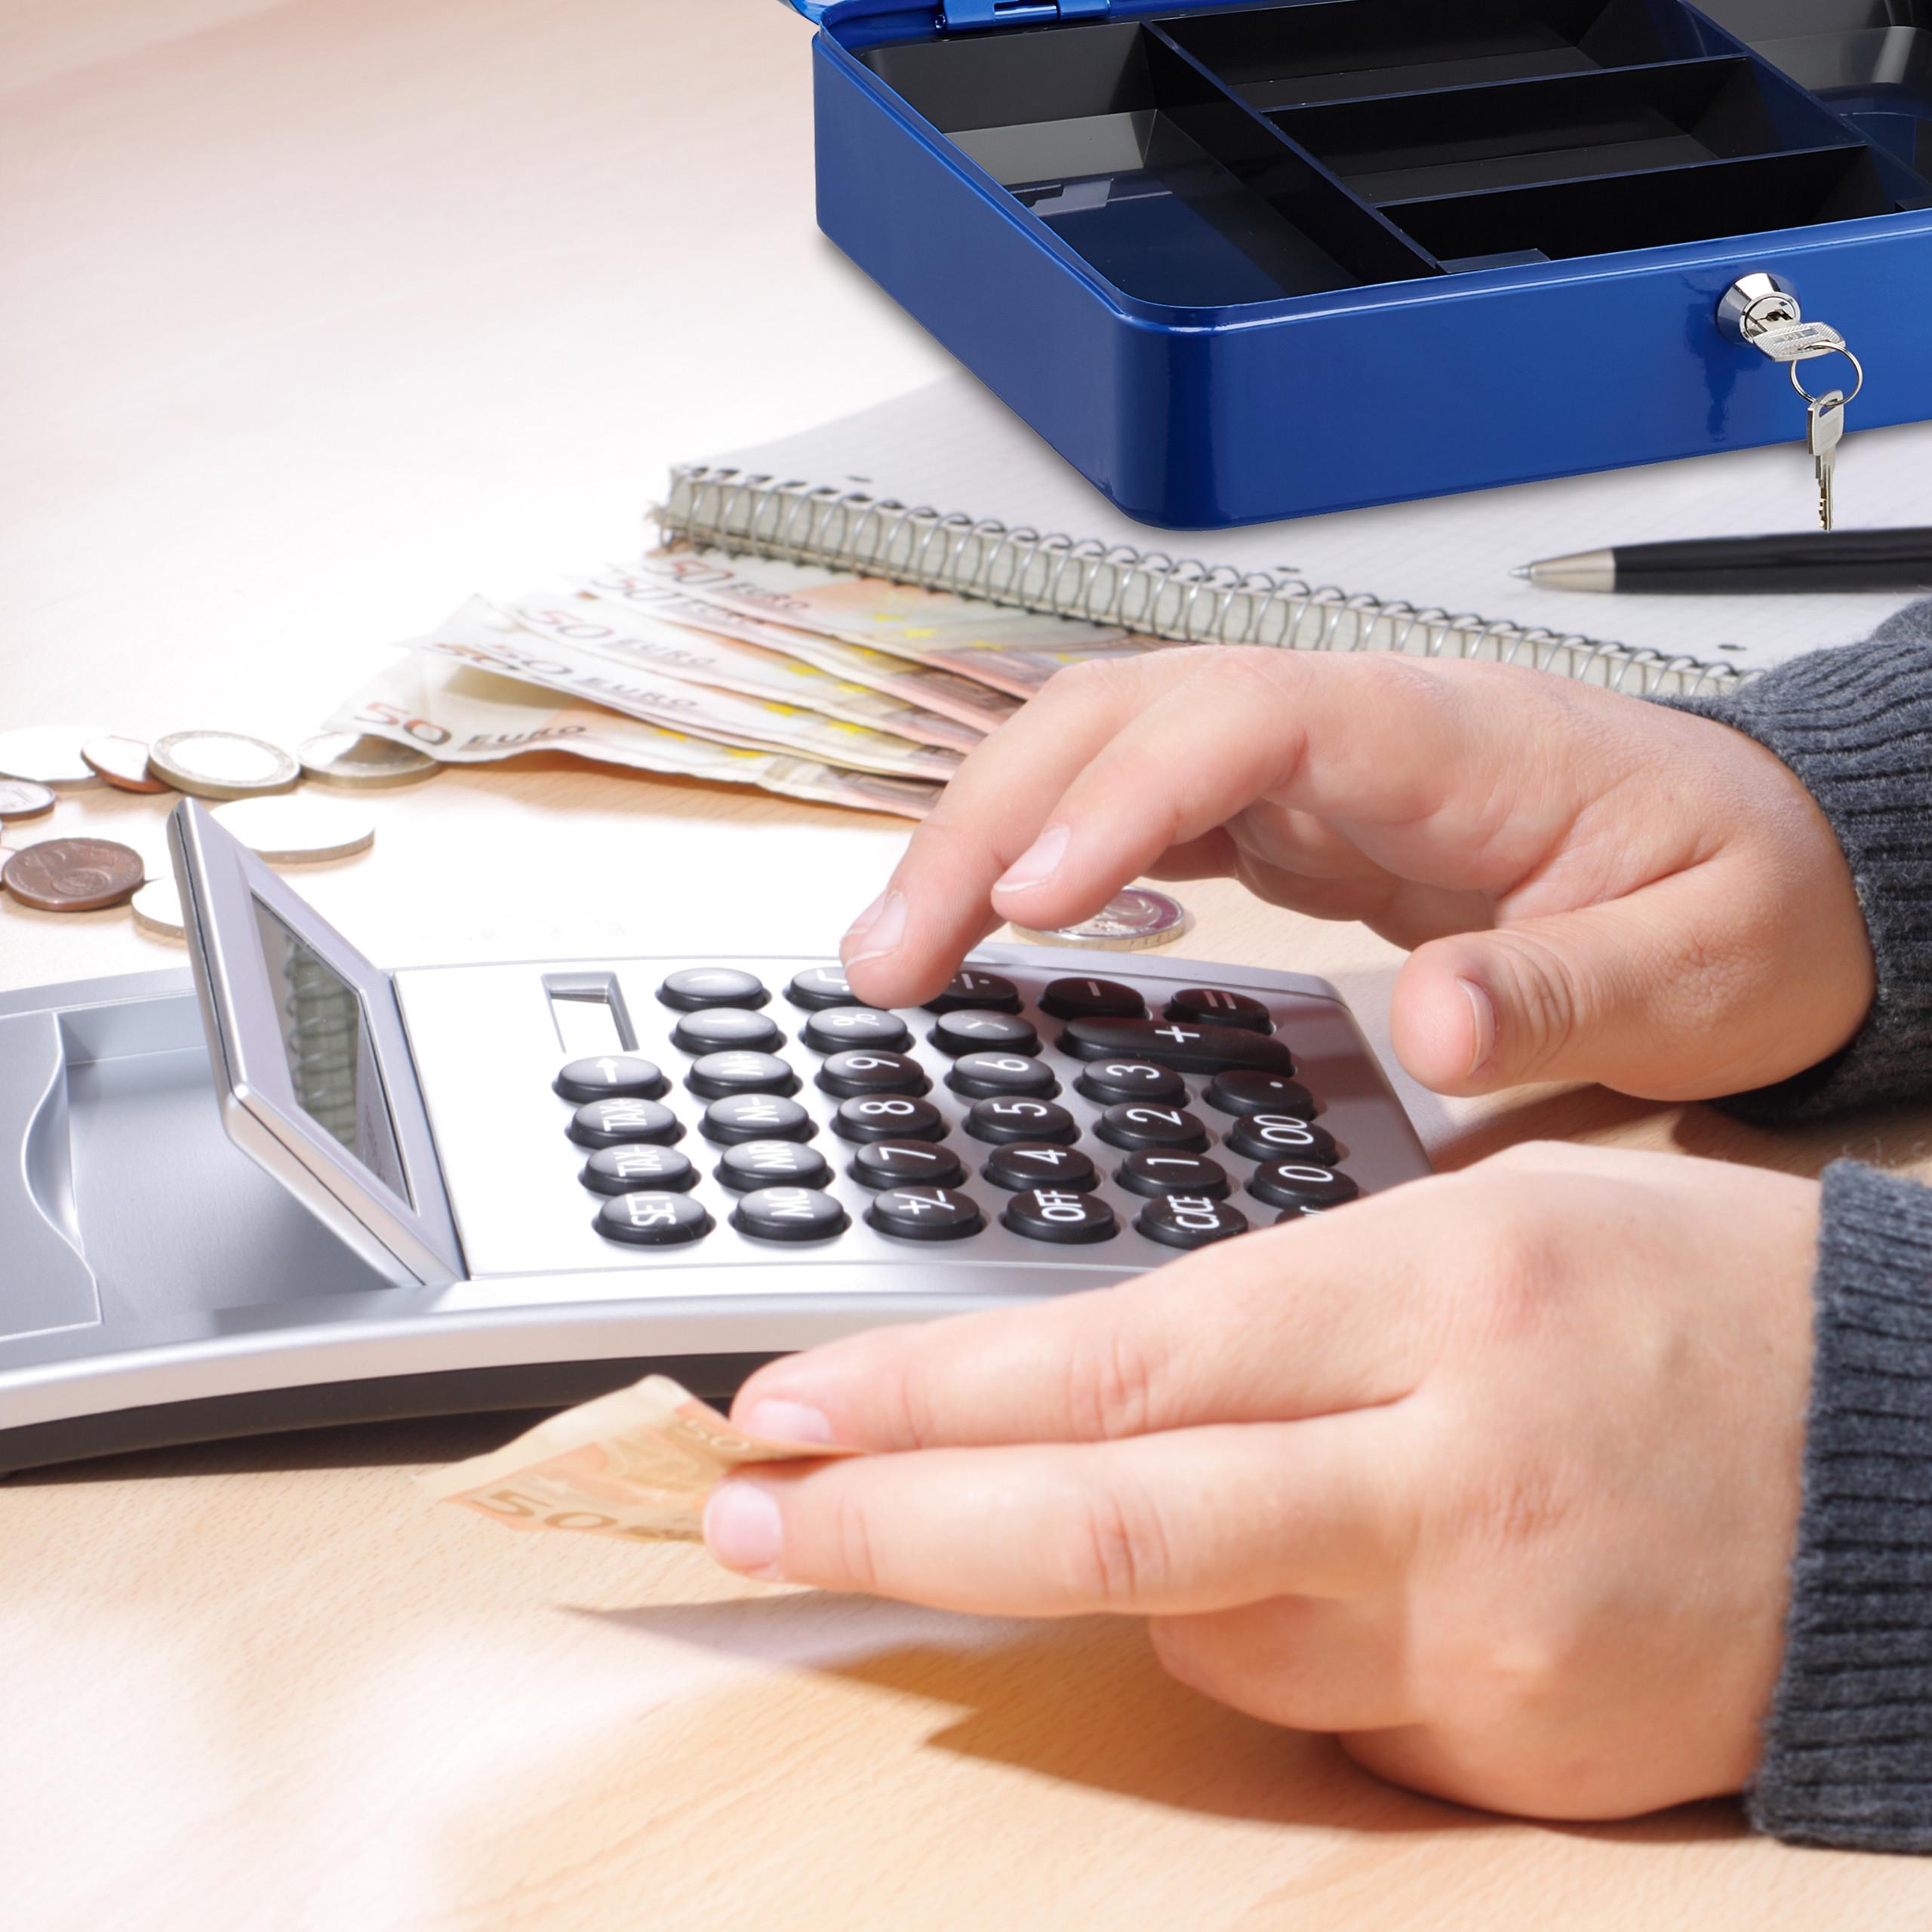 Lockable-Cash-Box-Large-Locking-Money-Box-with-2-Keys-Metal-Case-Safe thumbnail 13